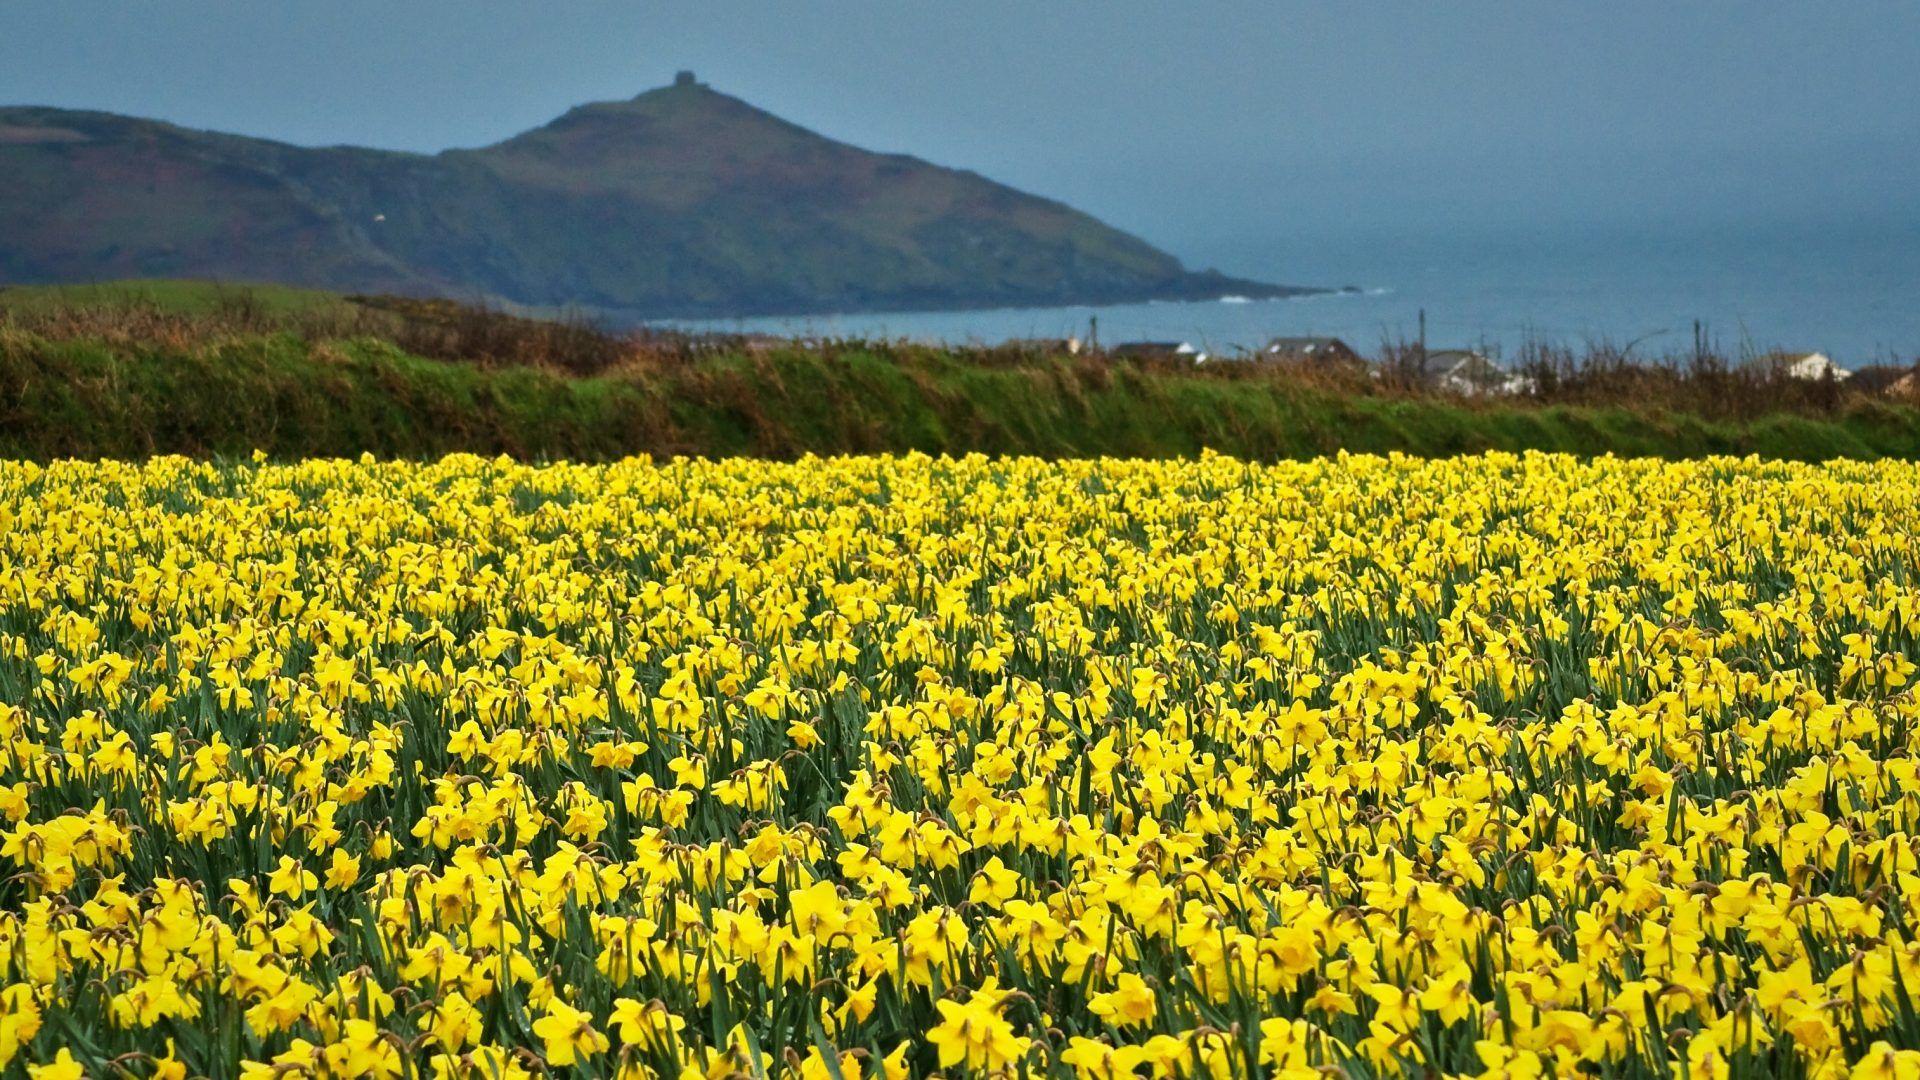 field daffodils beautiful yellow flower scenery [1920x1080] | reddit